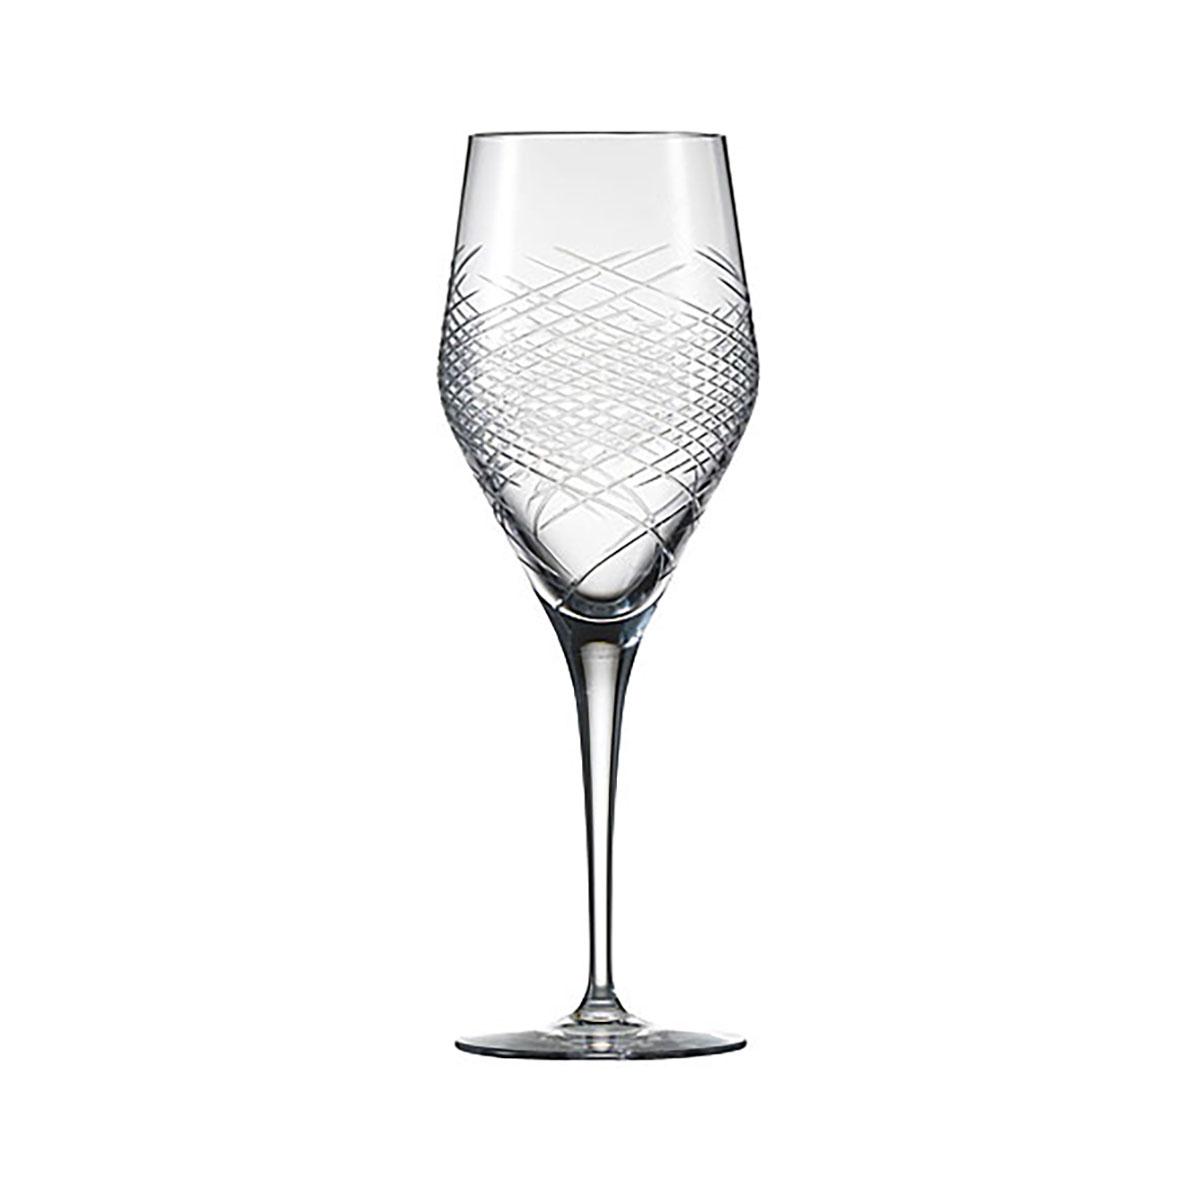 Zwiesel 1872 Charles Schumann Hommage Comete Bordeaux Glass, Pair